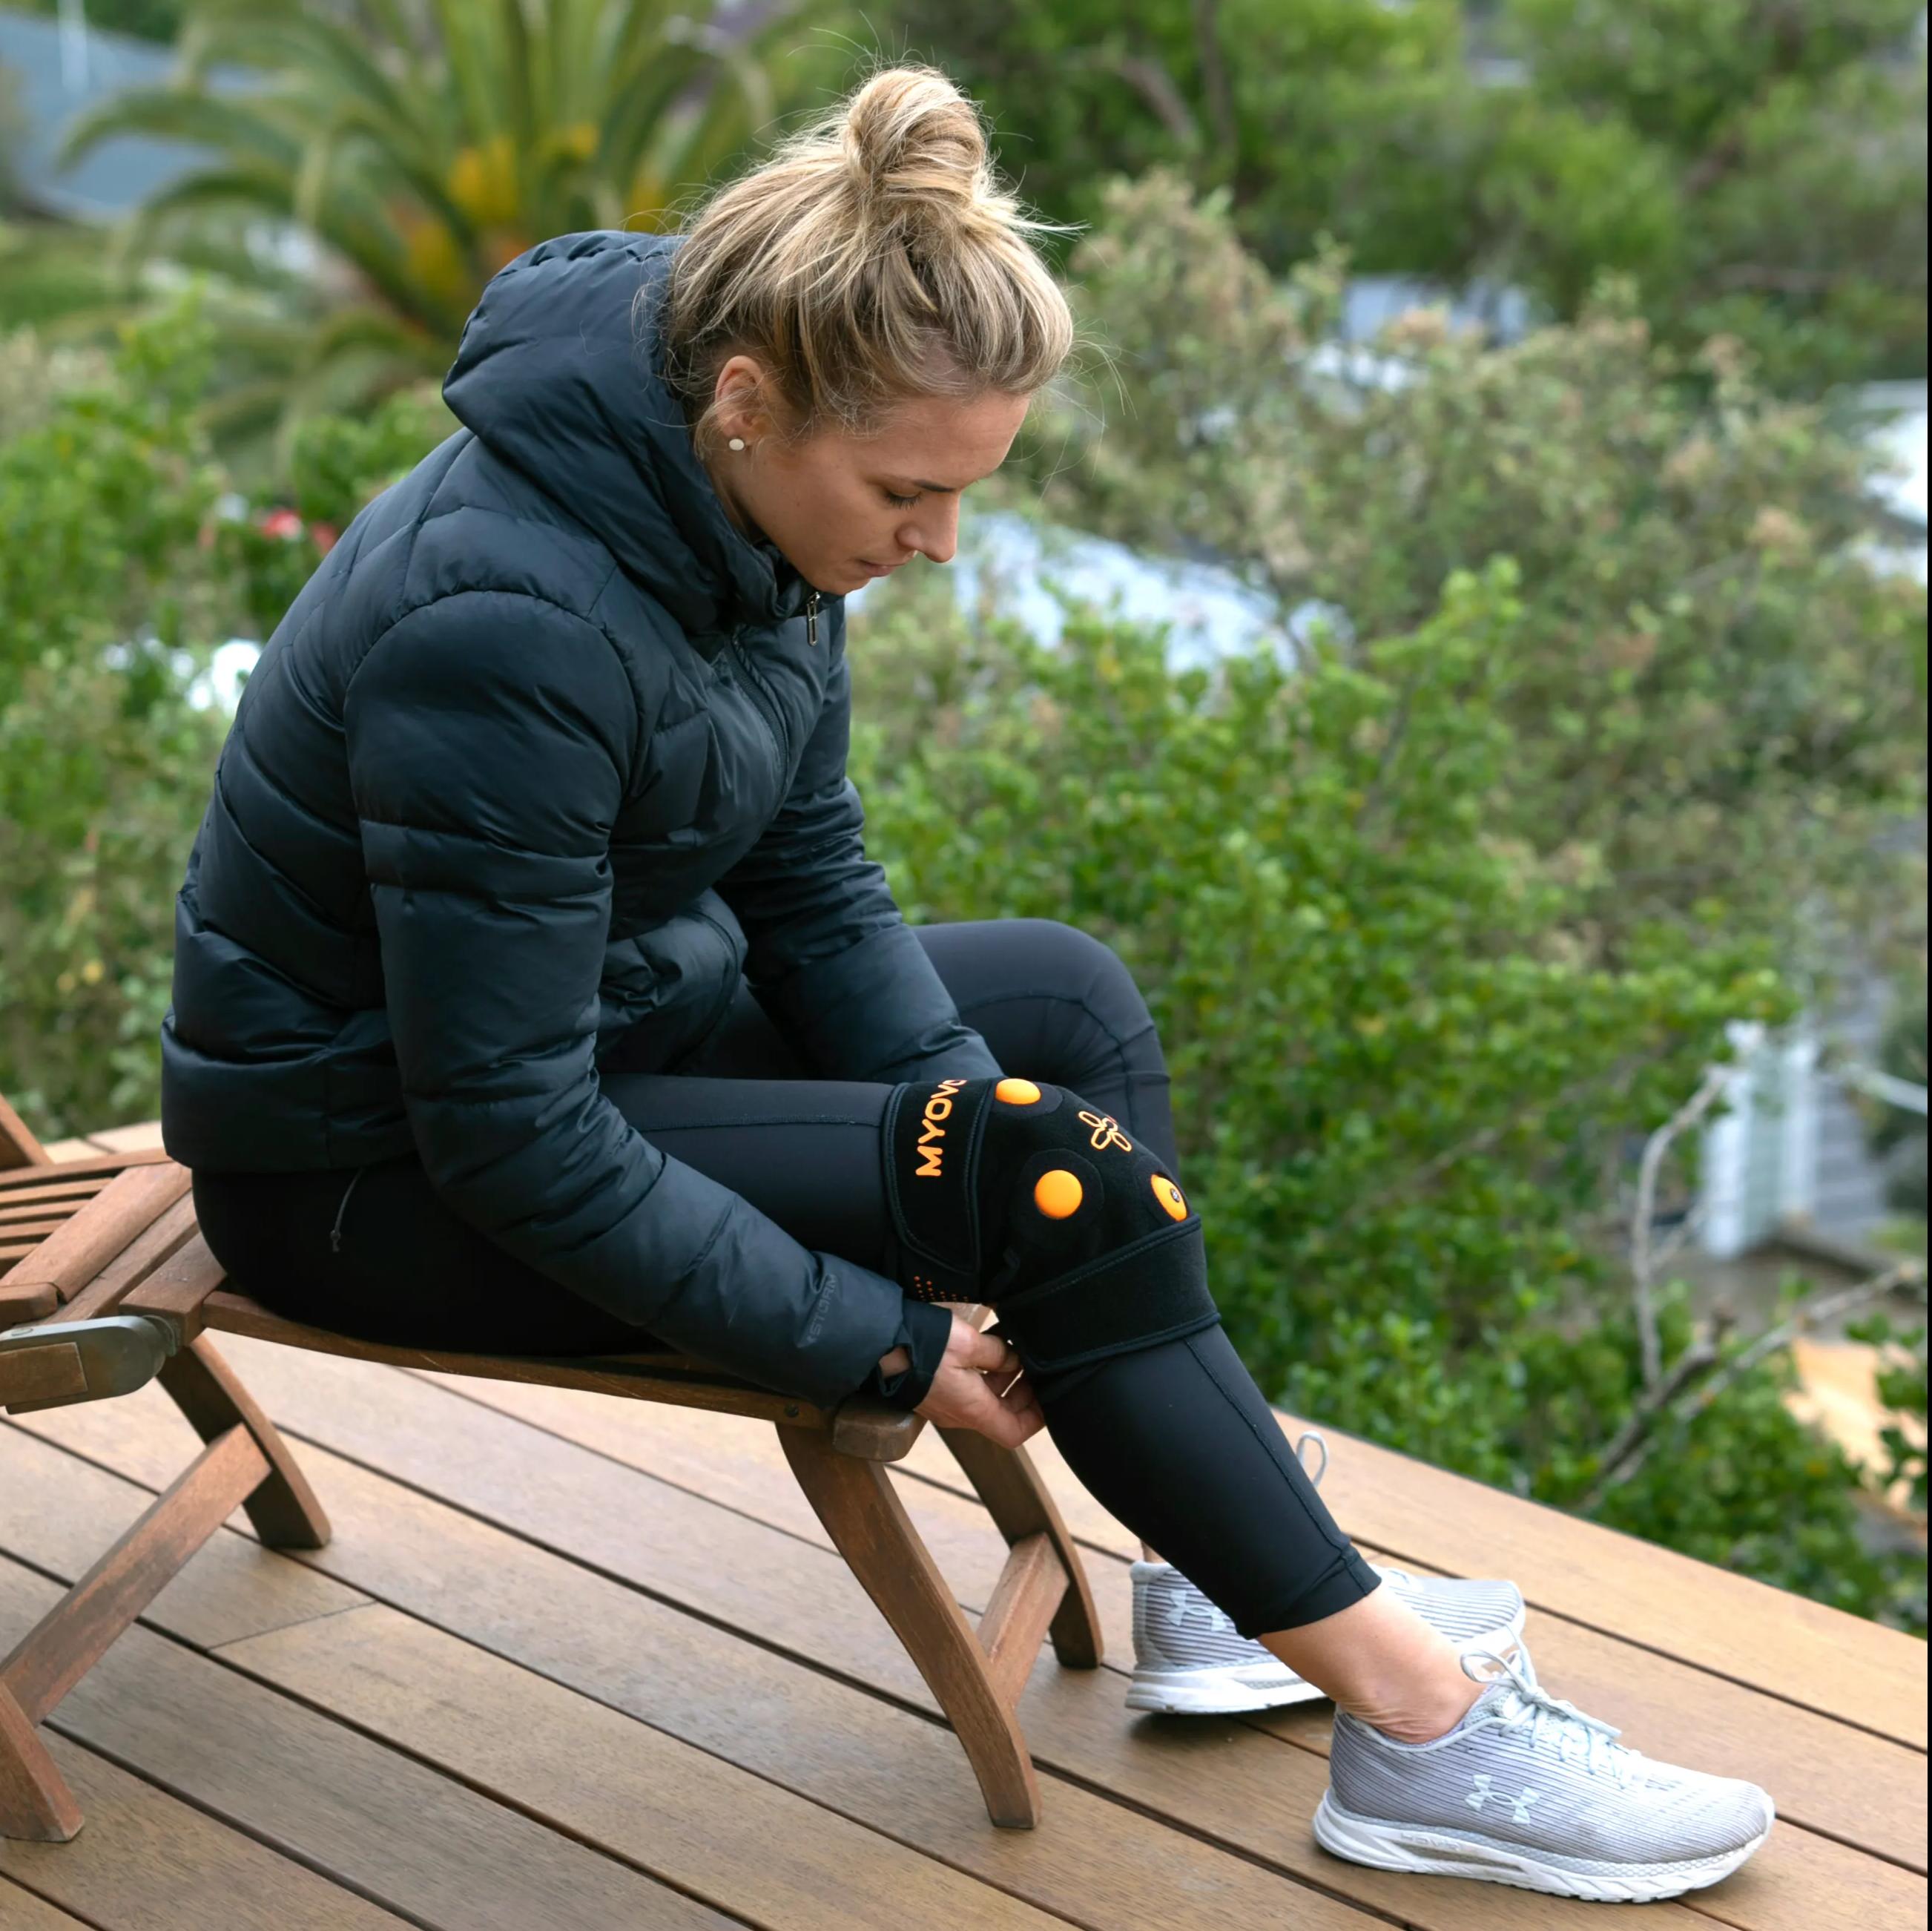 Dr Hannah Wells putting on Myovolt Leg  on bench